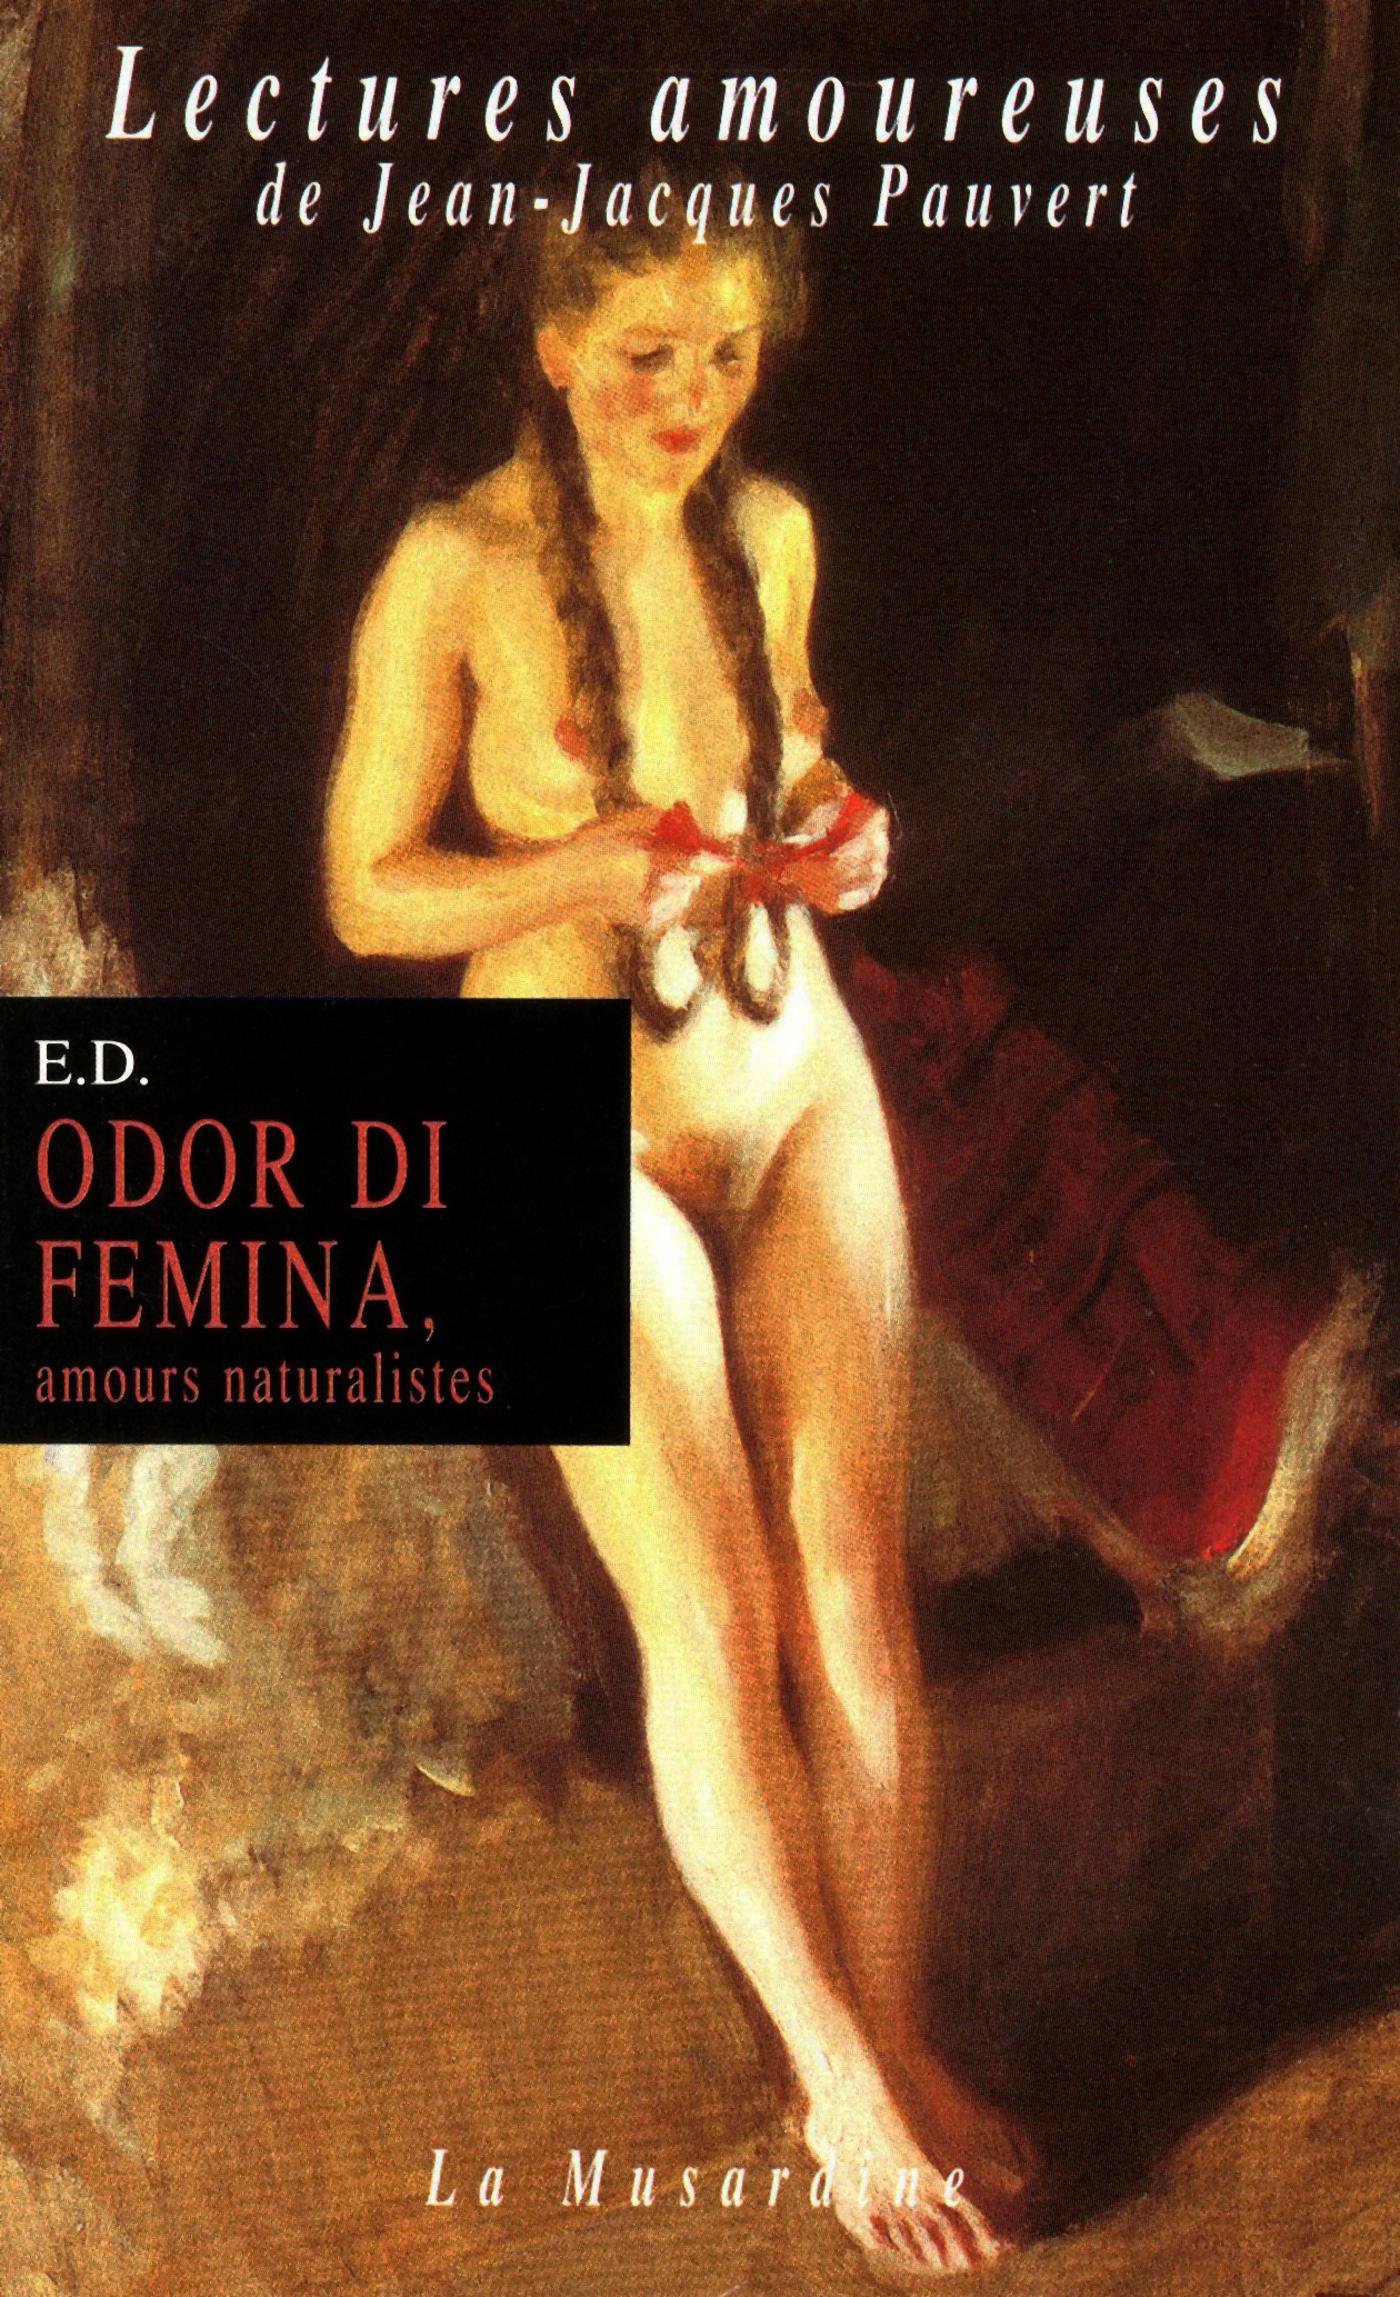 Odor di femina - Amours naturalistes